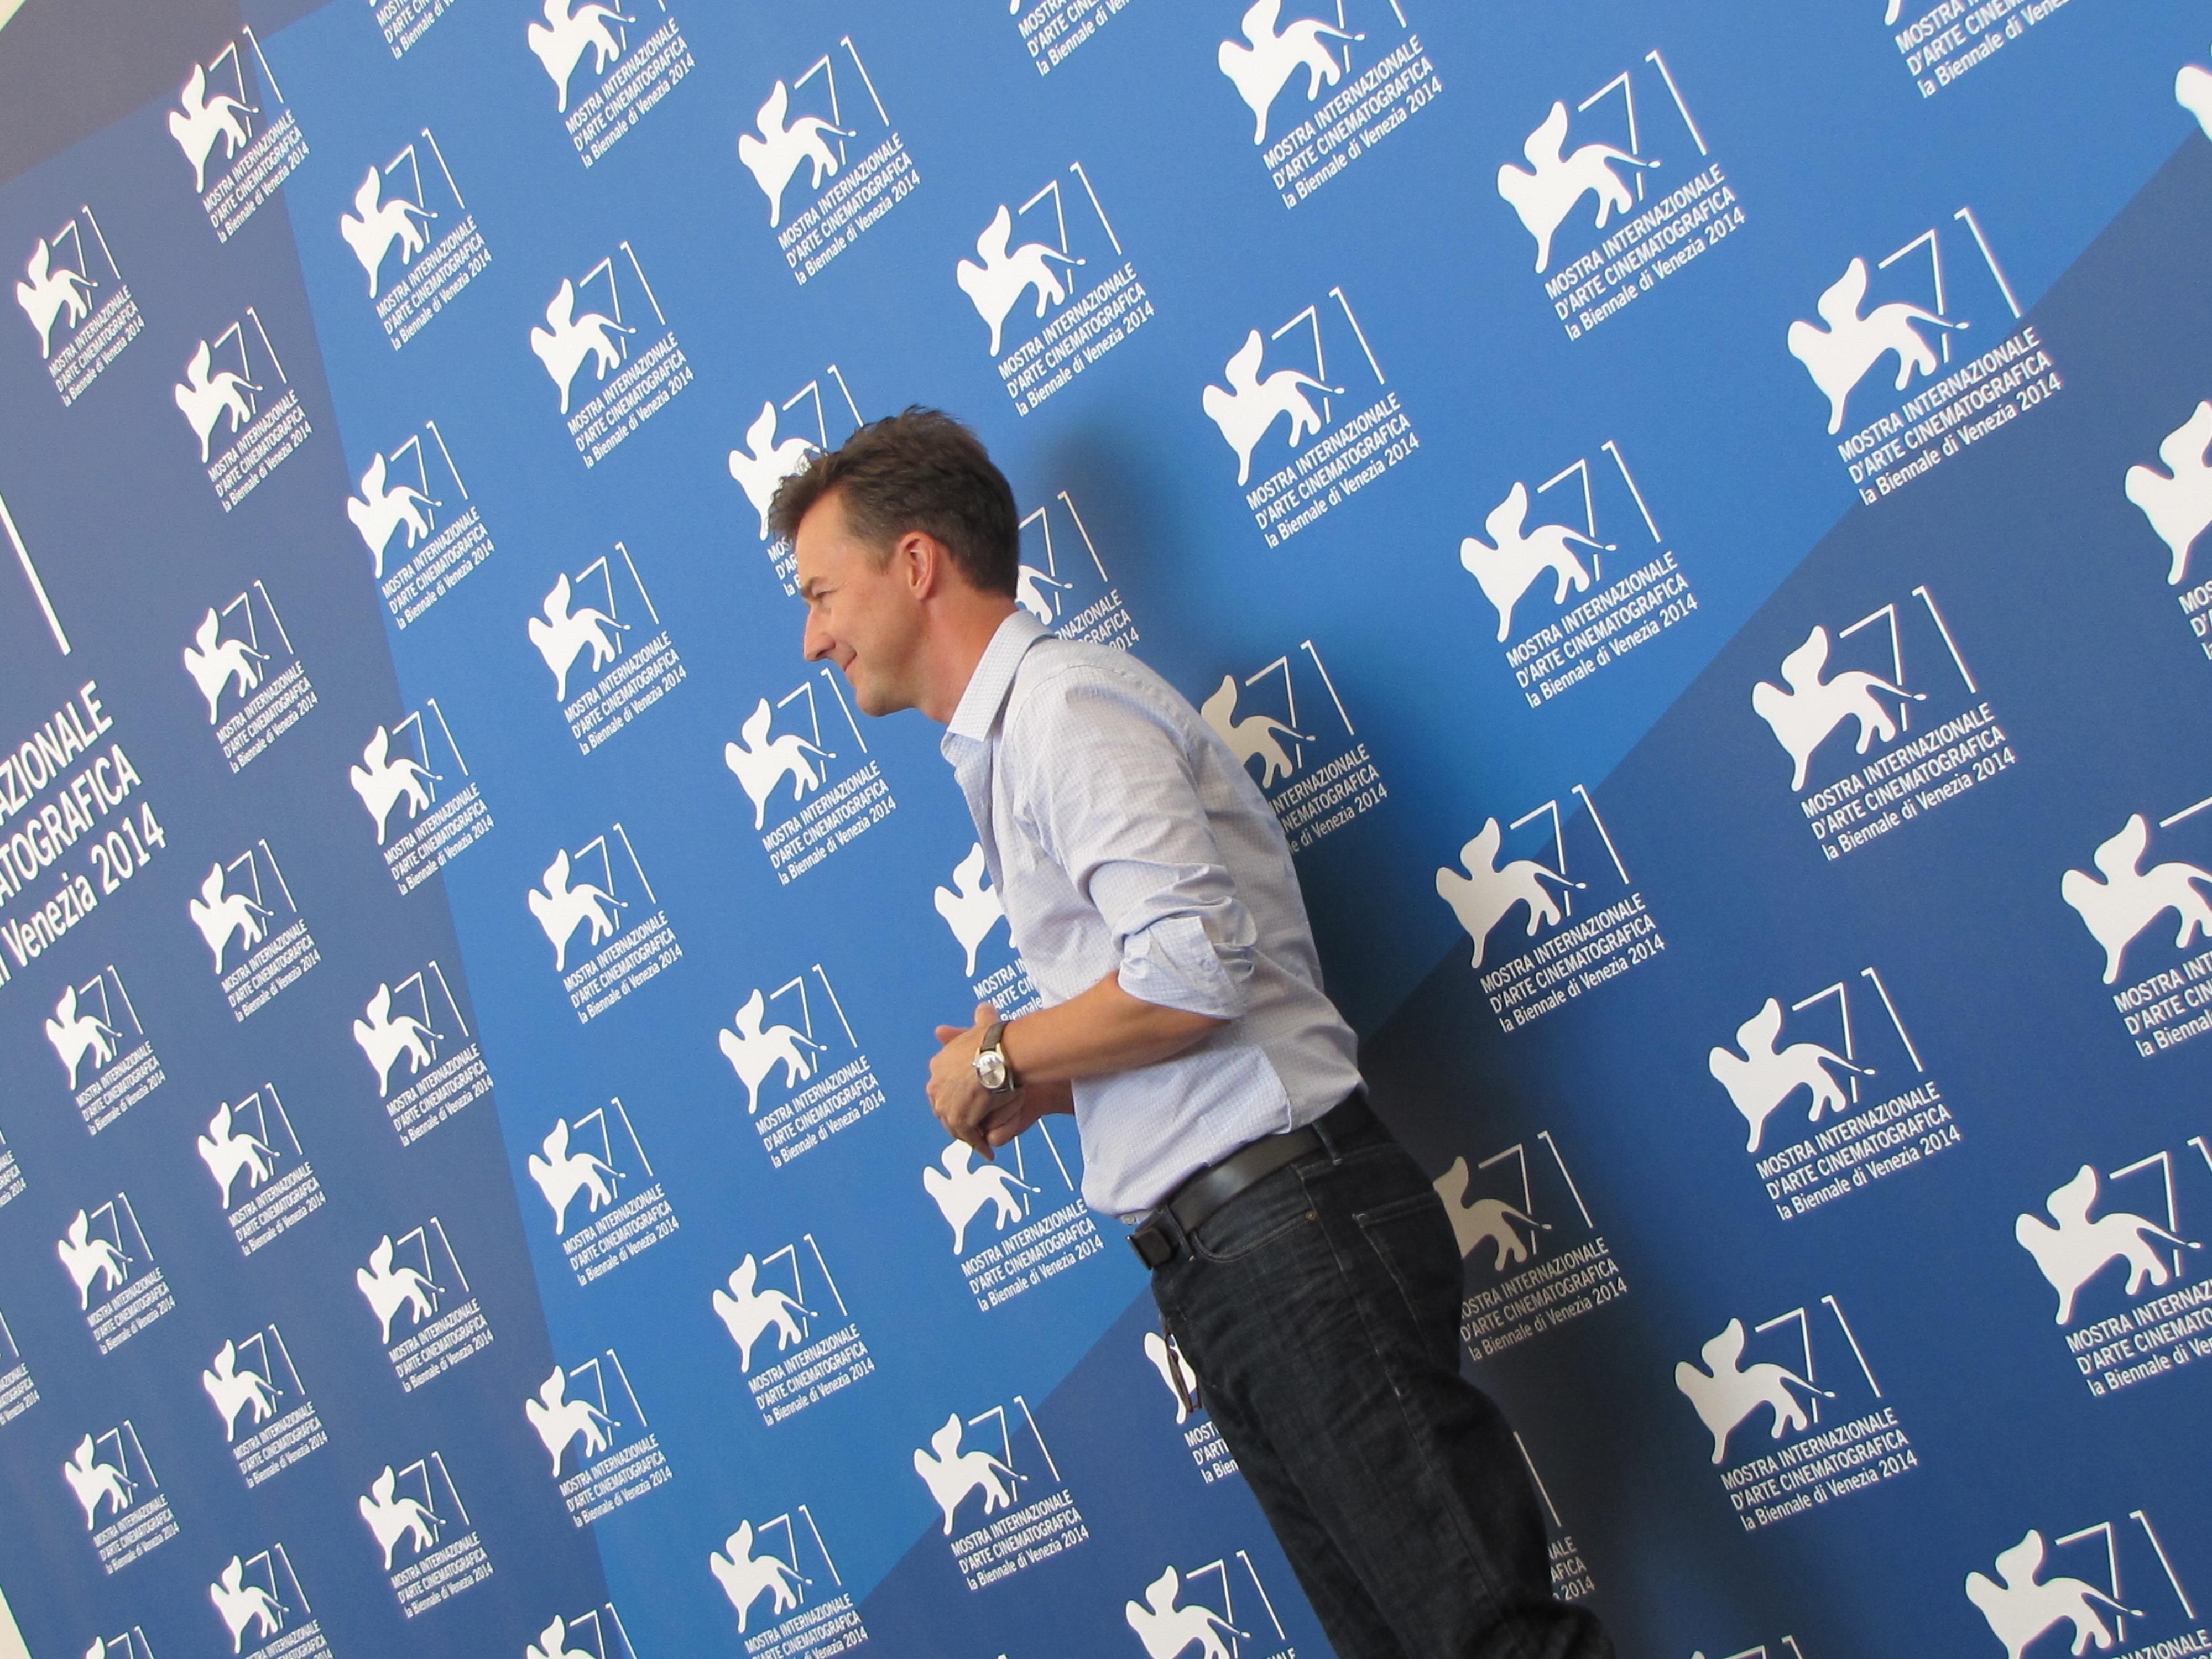 Ed Norton presenta Birdman a Venezia 71, nel 2014